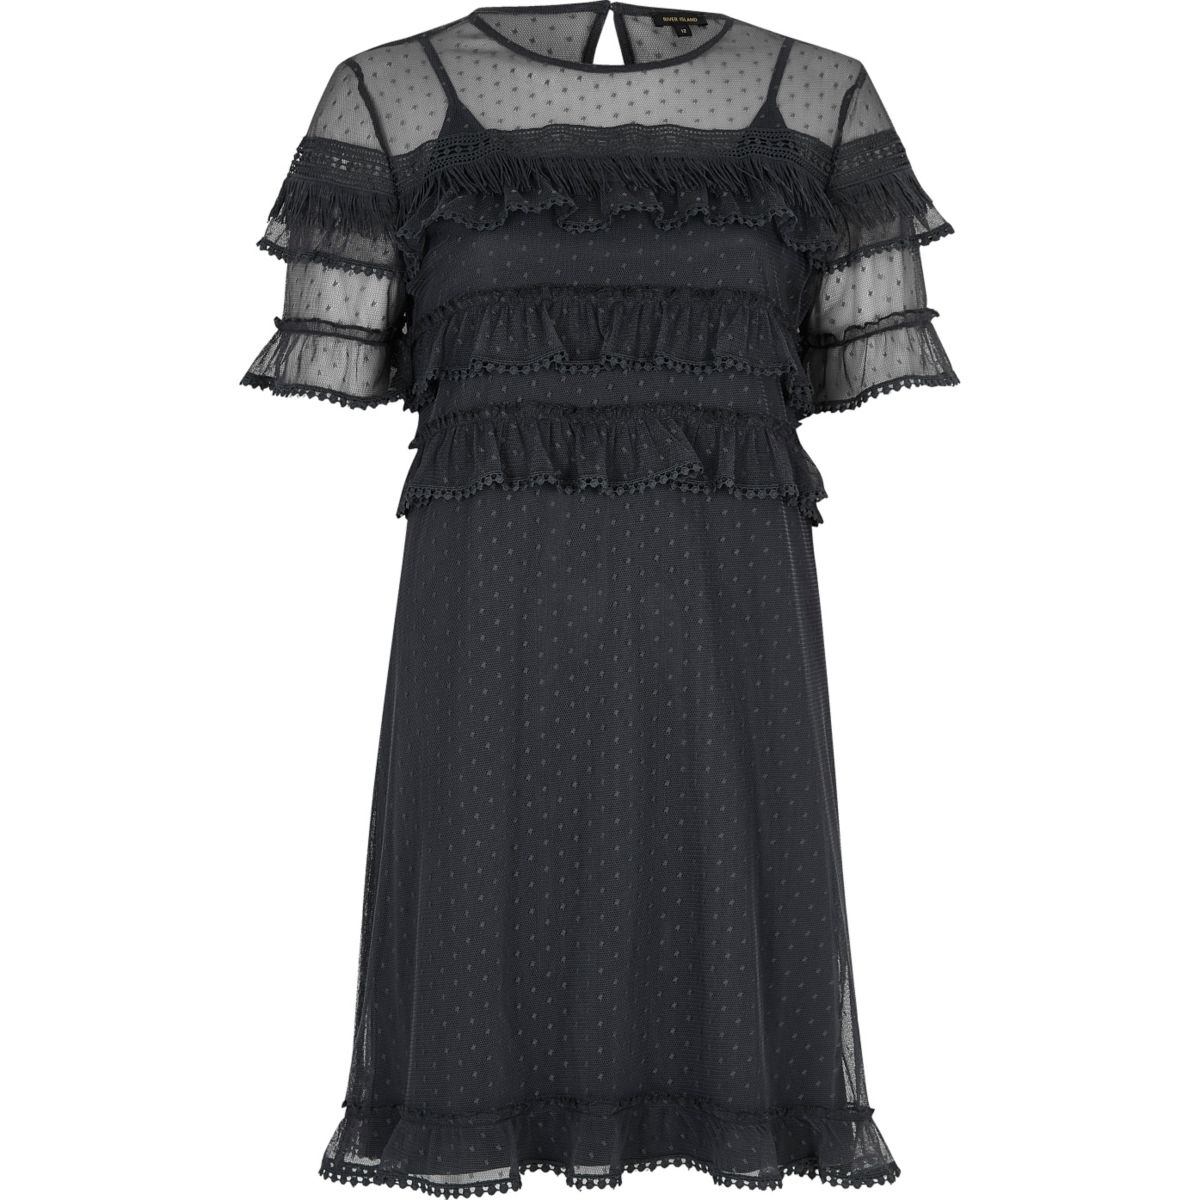 Dark grey mesh frill dress